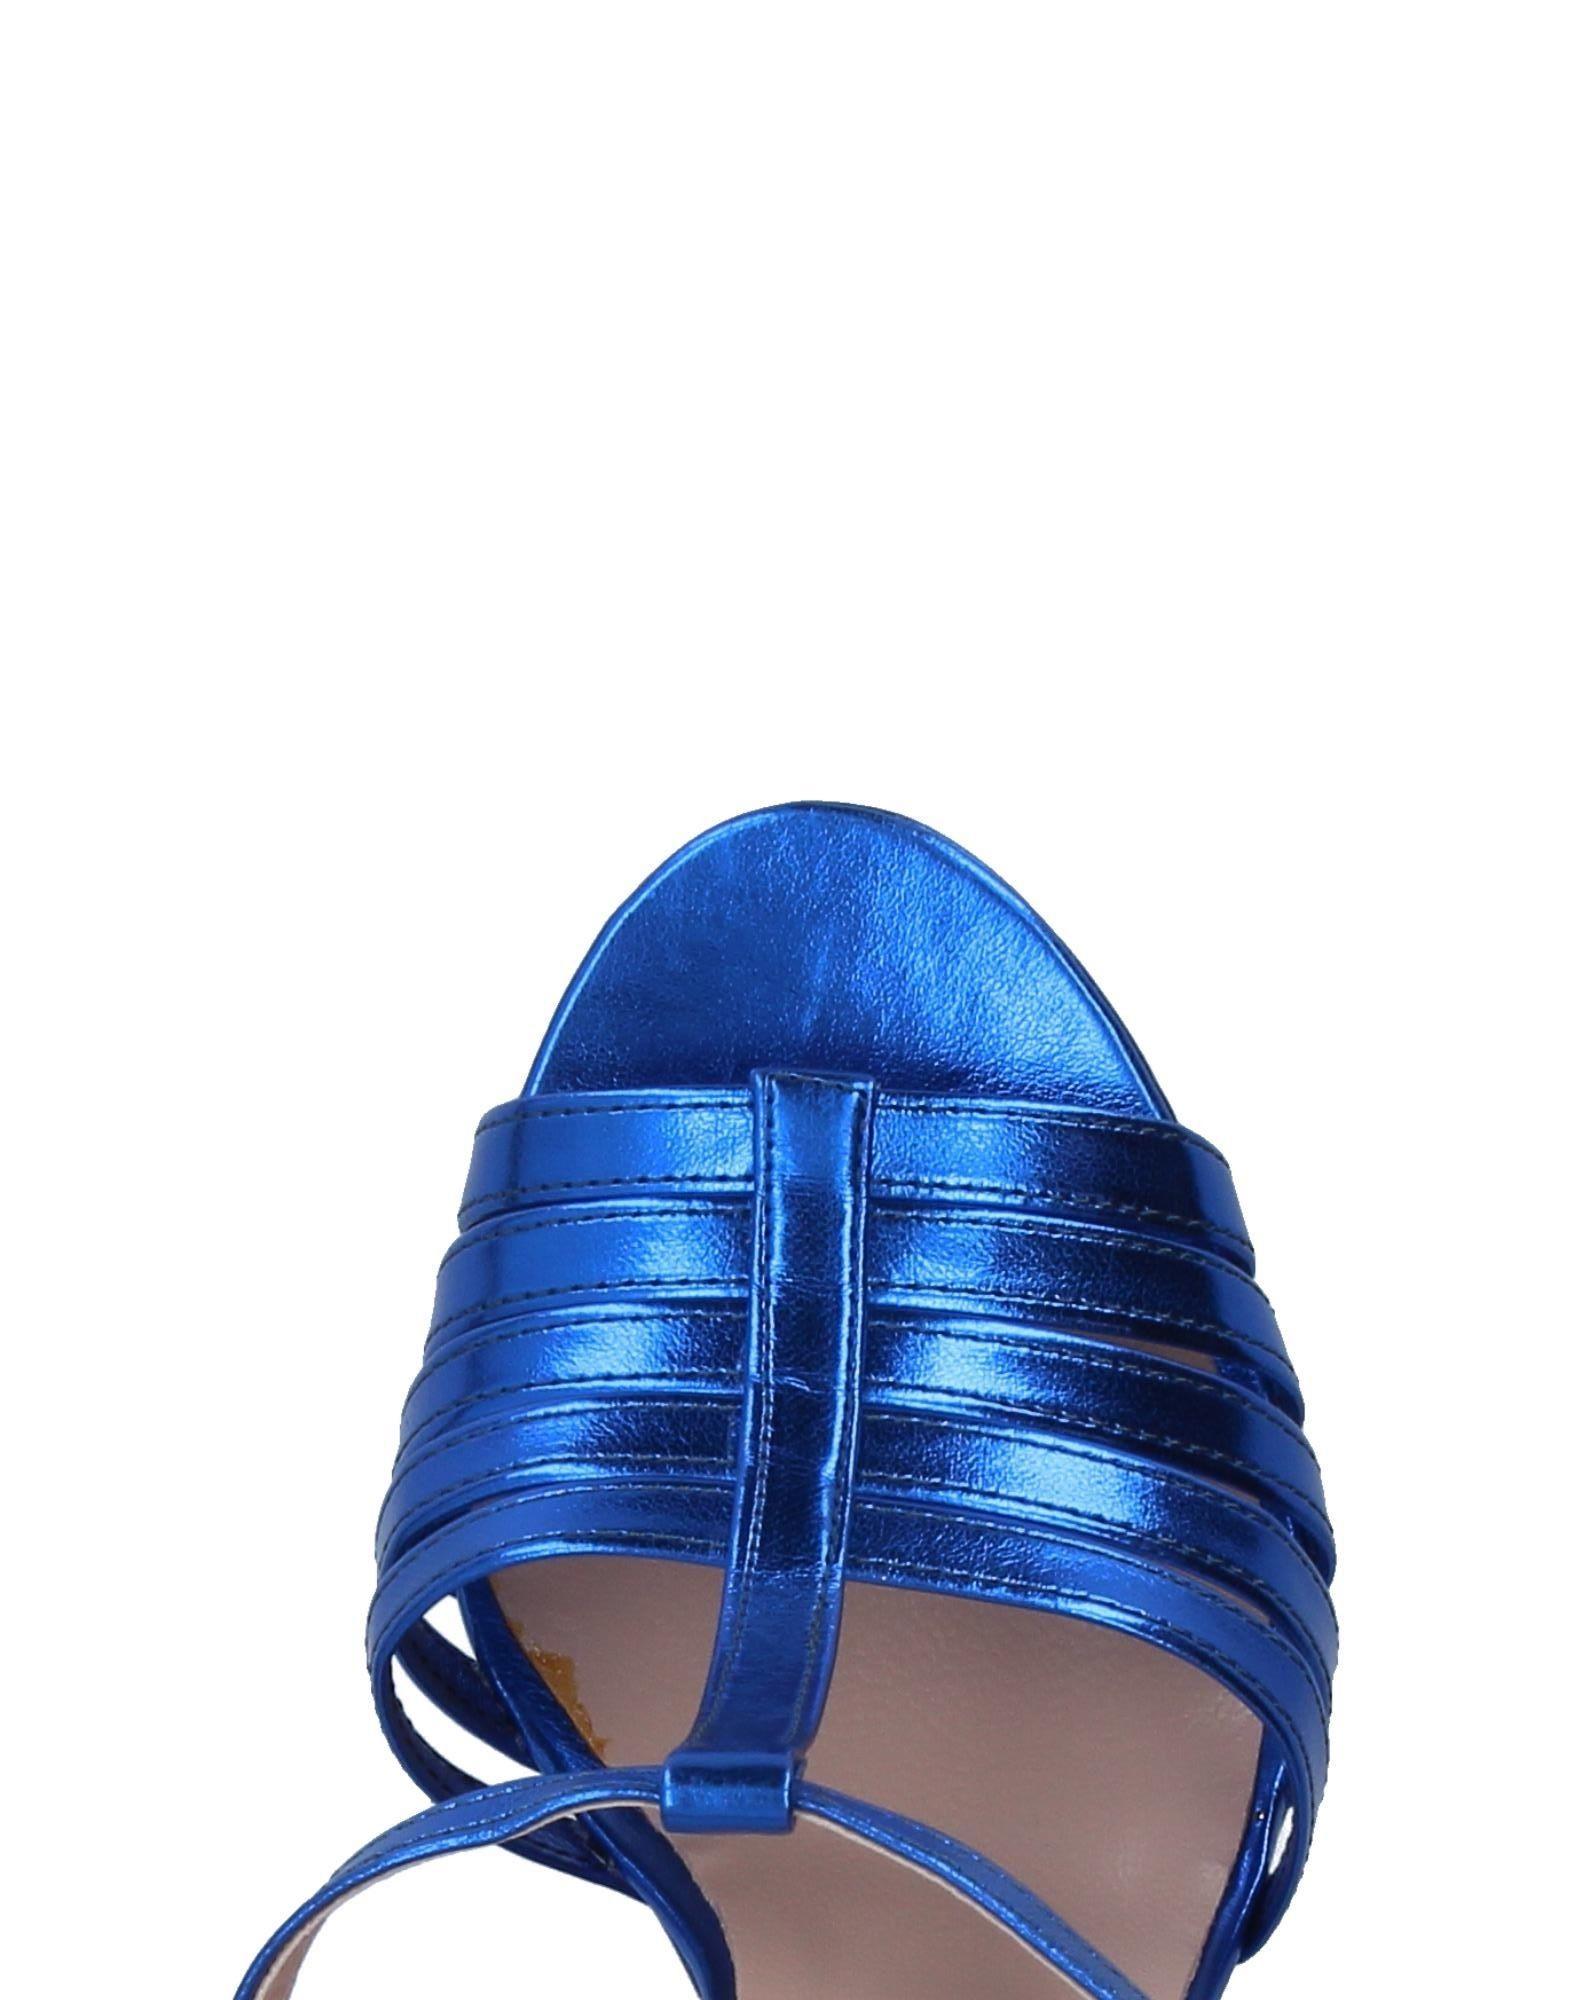 Divine Follie Sandalen Damen  11375146KL Qualität Gute Qualität 11375146KL beliebte Schuhe 4b3036